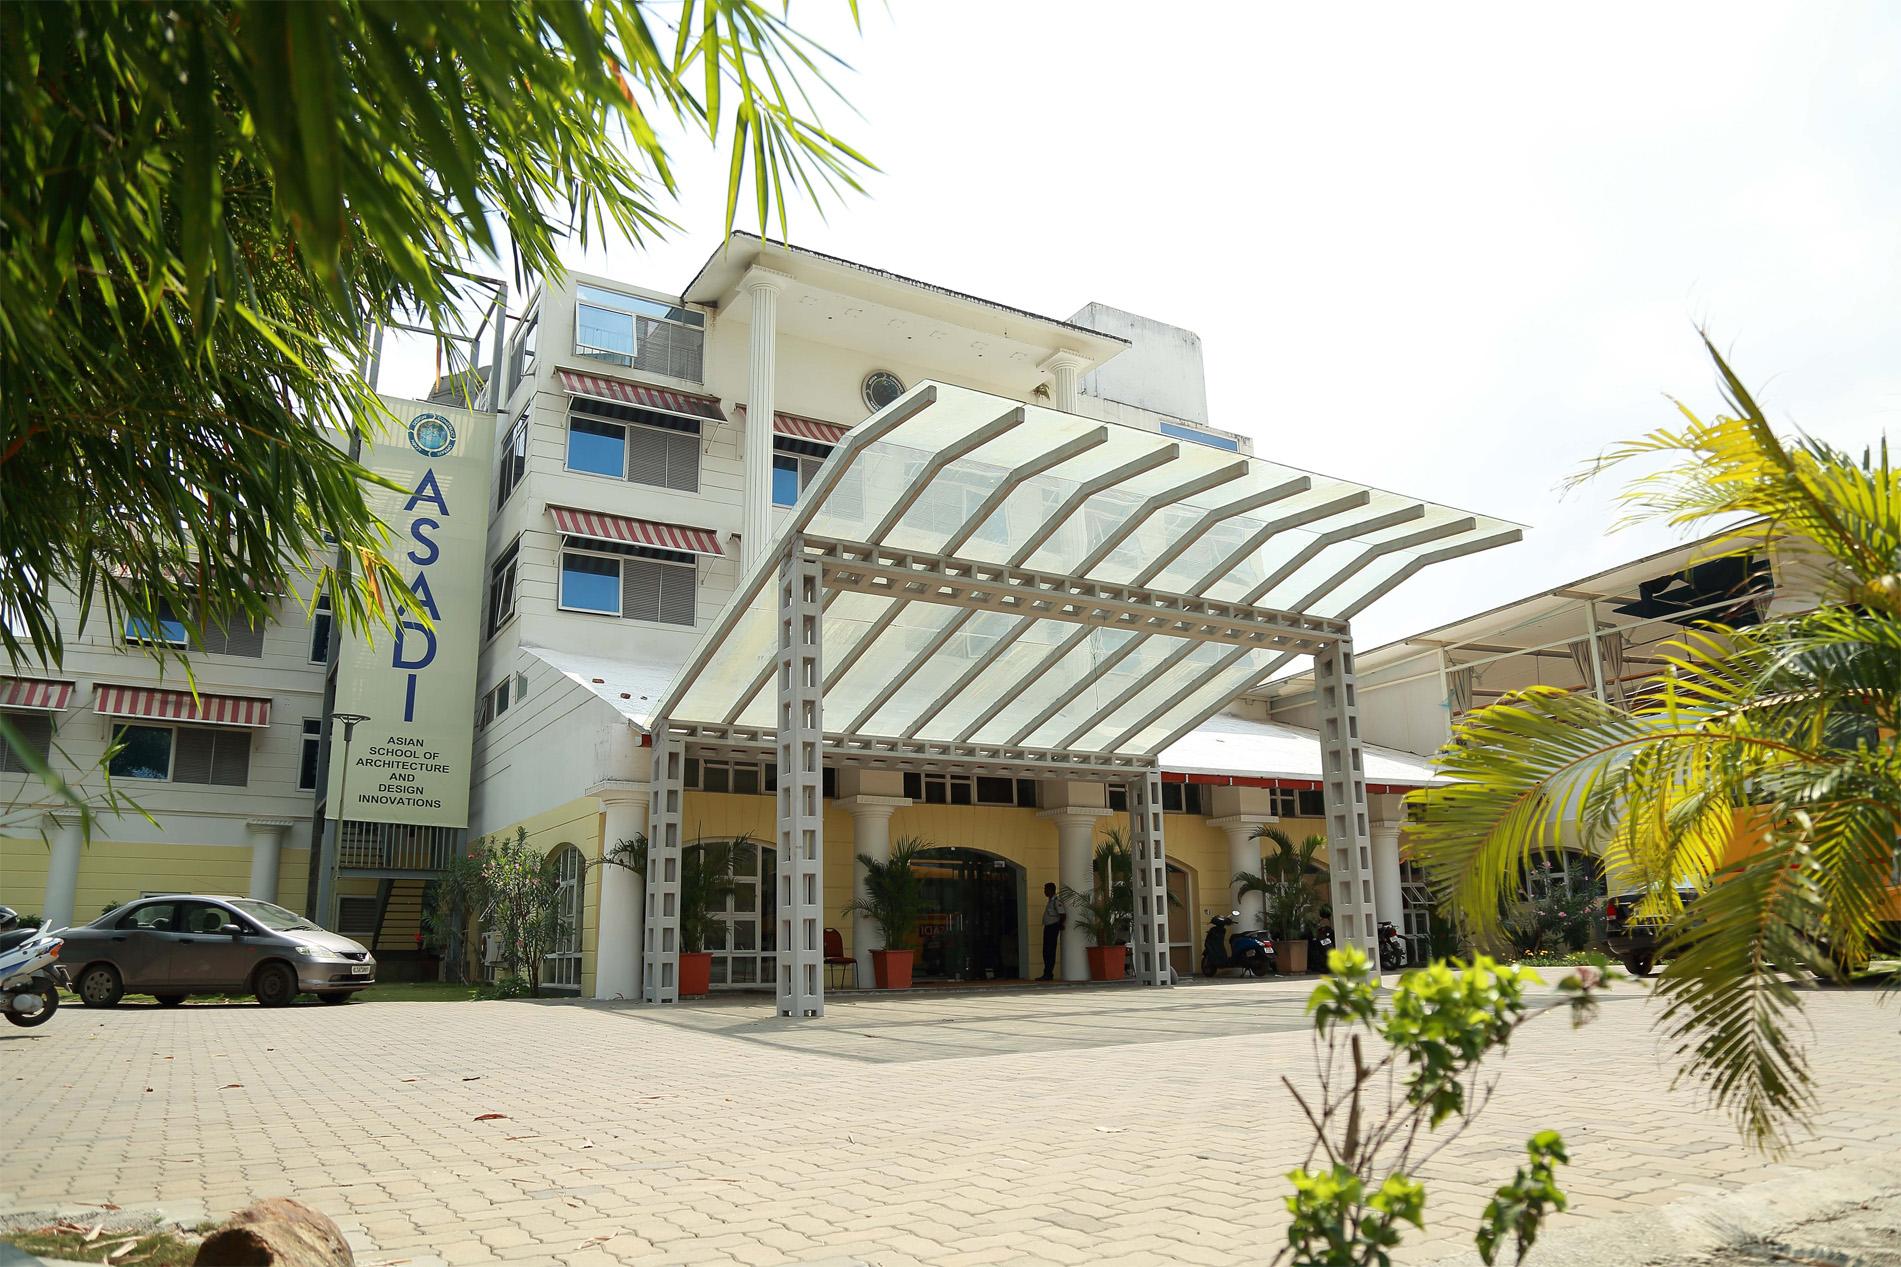 ASADI (Asian School of Architecture and Design Innovation), Kochi